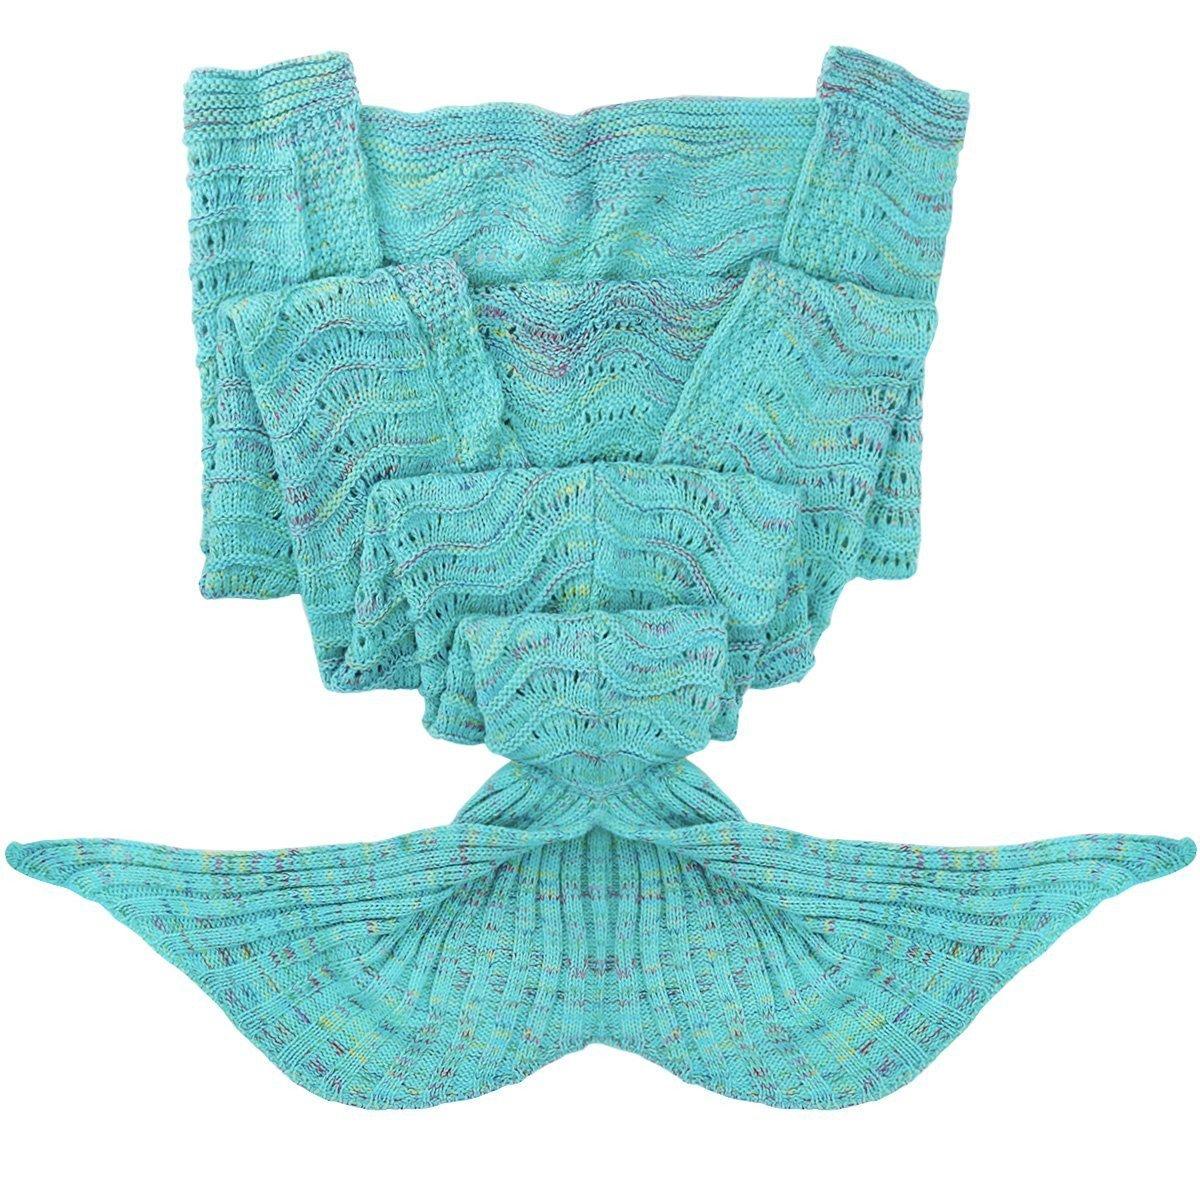 Fu Store Mermaid Tail Blanket Crochet Mermaid Blanket for Adult, Super Soft All Seasons Sofa Sleeping Blanket, Cool Birthday Wedding Christmas, 71 x 35 Inches, Mint Green by Fu Store (Image #5)